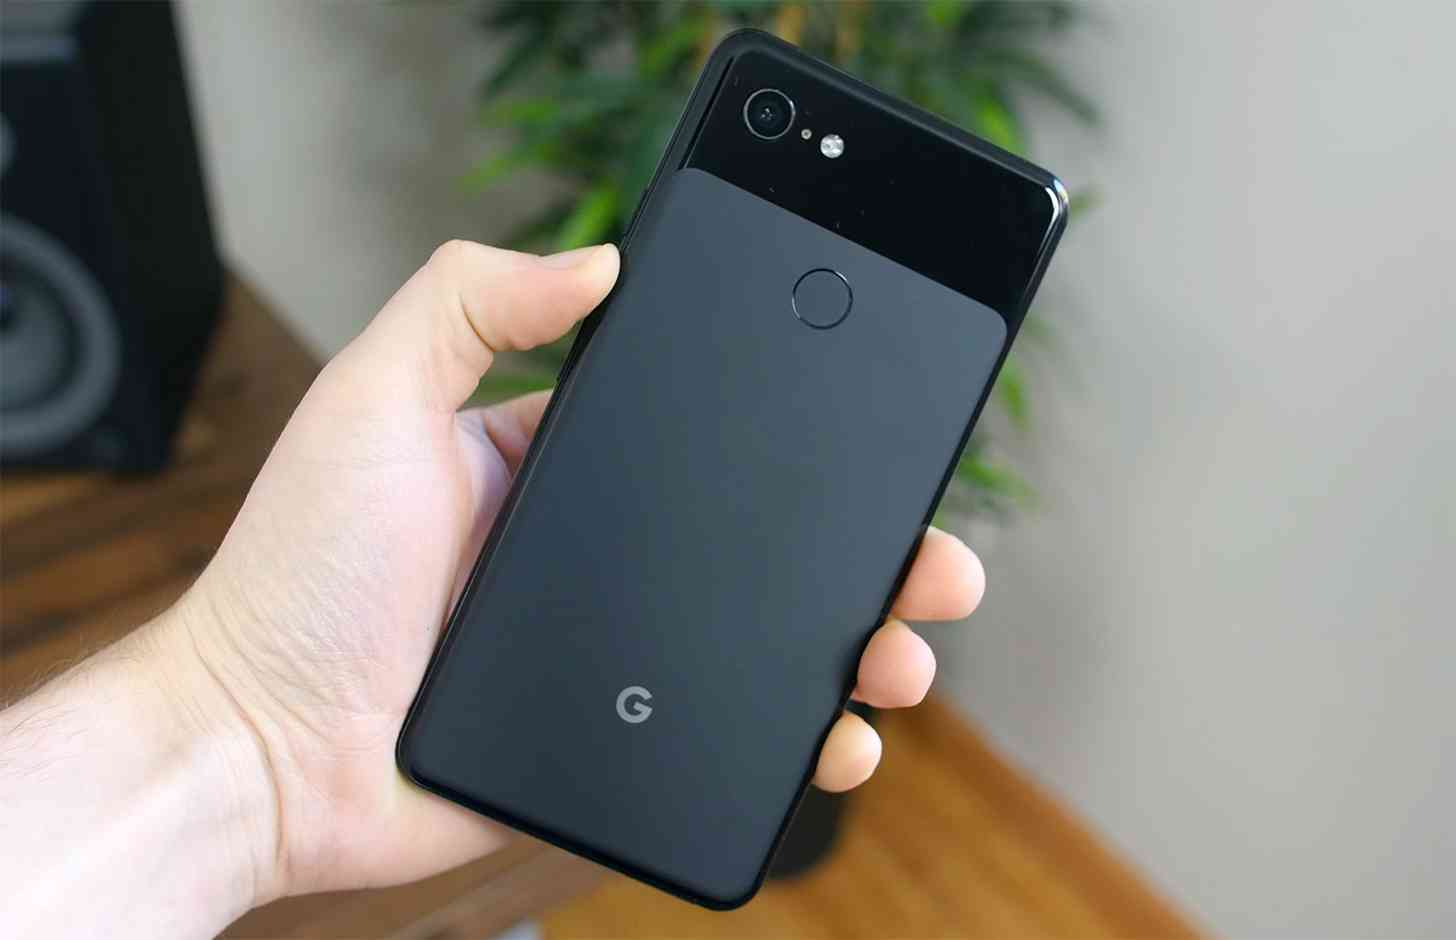 Google Pixel 3 XL rear